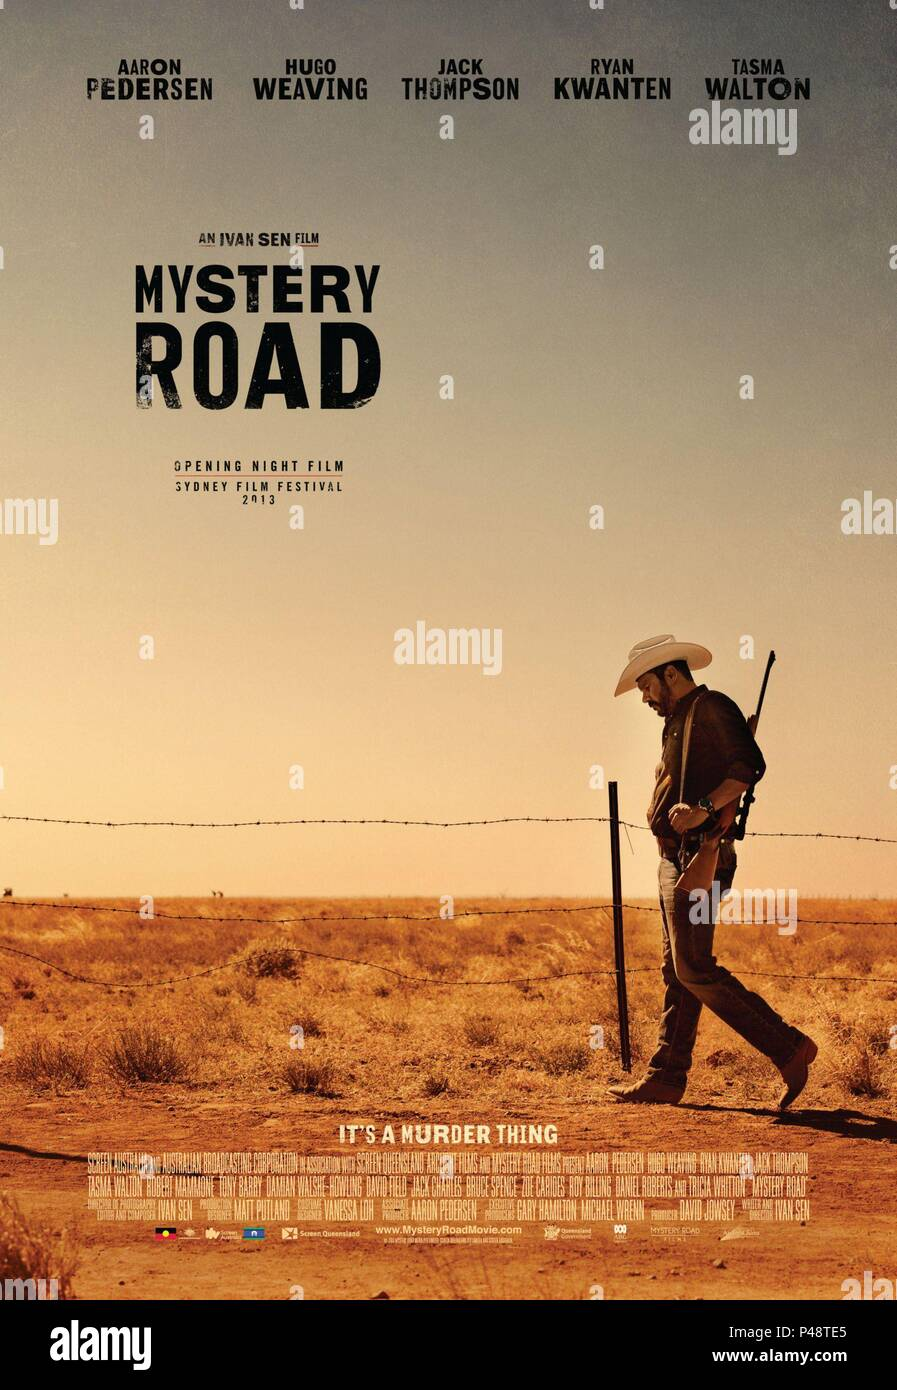 Original Film Title: MYSTERY ROAD.  English Title: MYSTERY ROAD.  Film Director: IVAN SEN.  Year: 2013. Credit: SCREEN AUSTRALIA / Album - Stock Image